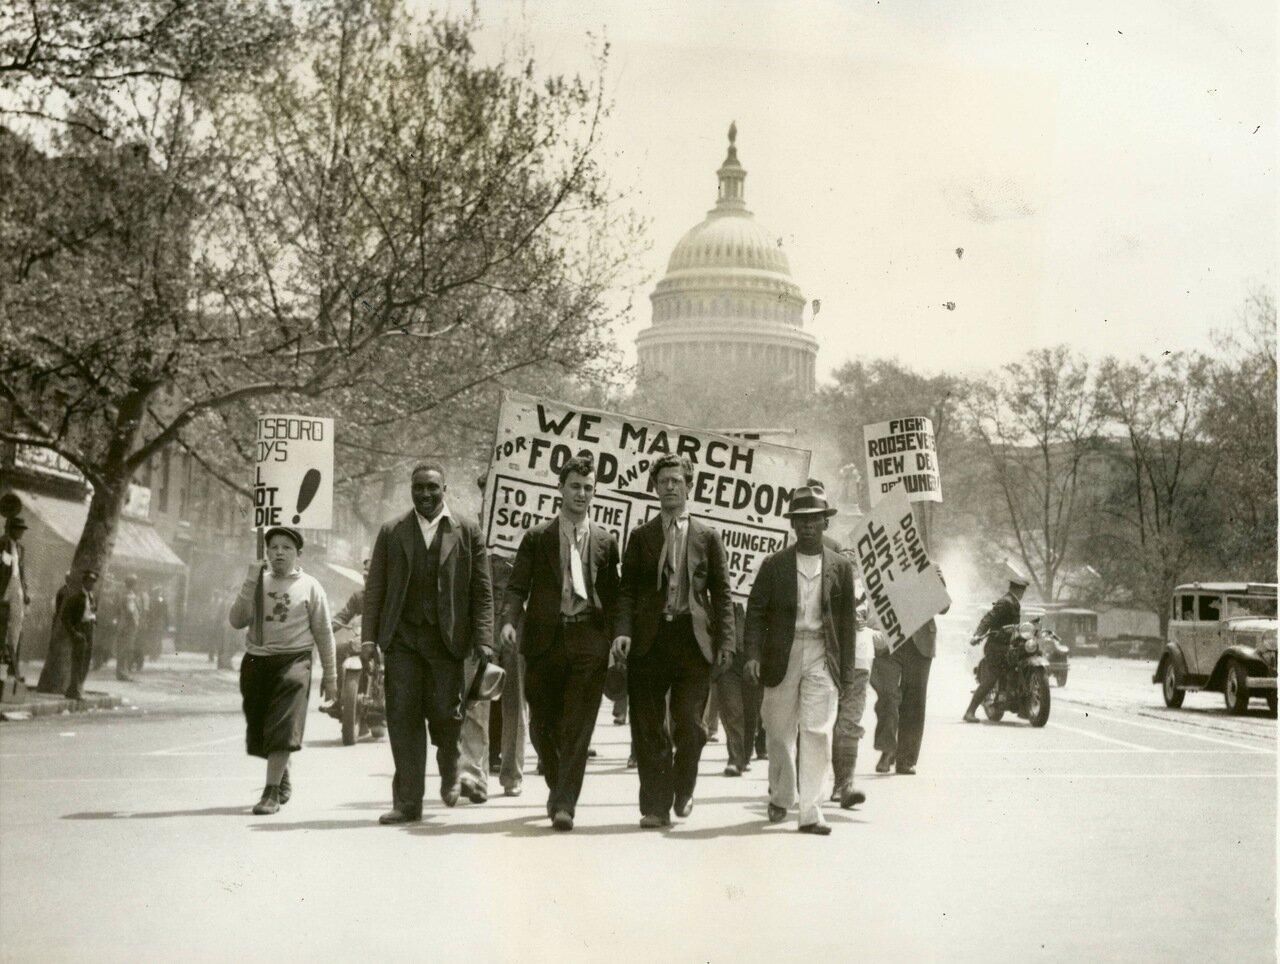 1933. Коммунистический парад, Вашингтон, округ Колумбия